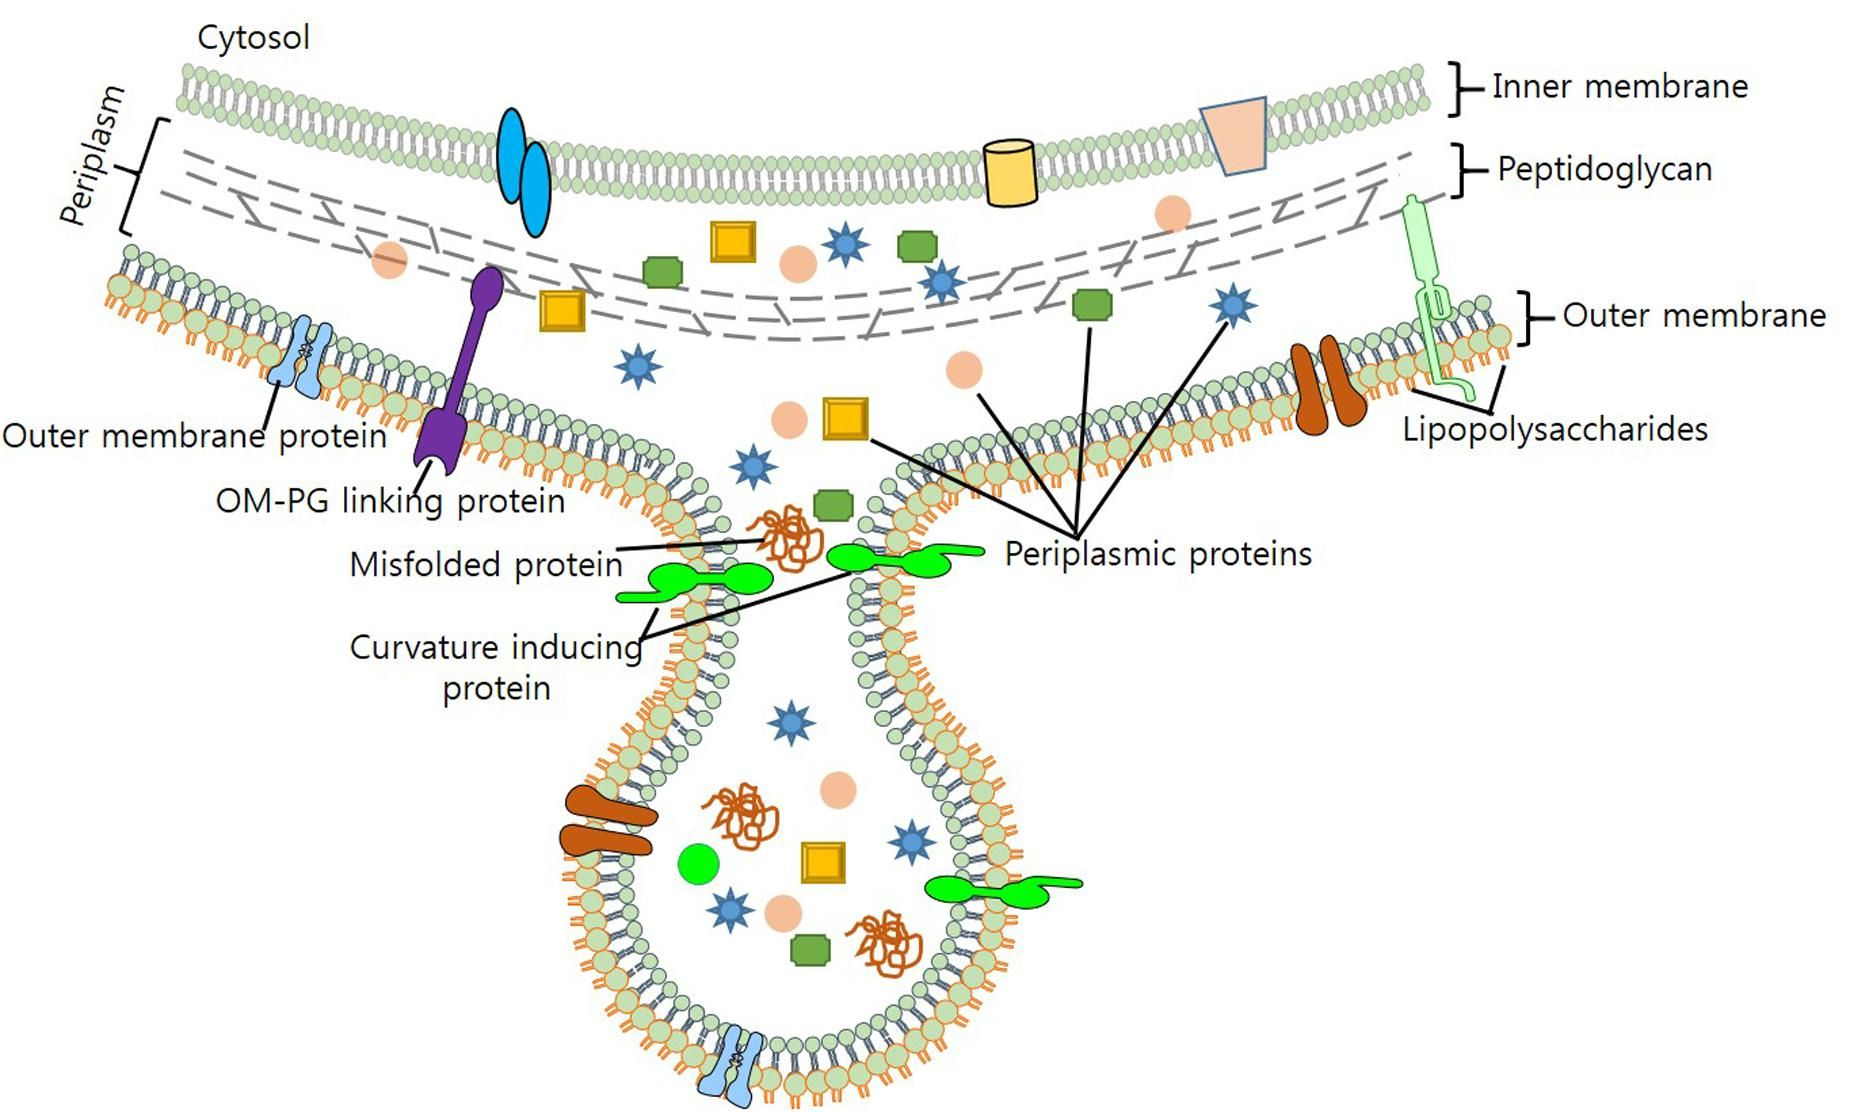 Outer Membrane Vesicles Of Gram Negative Bacteria